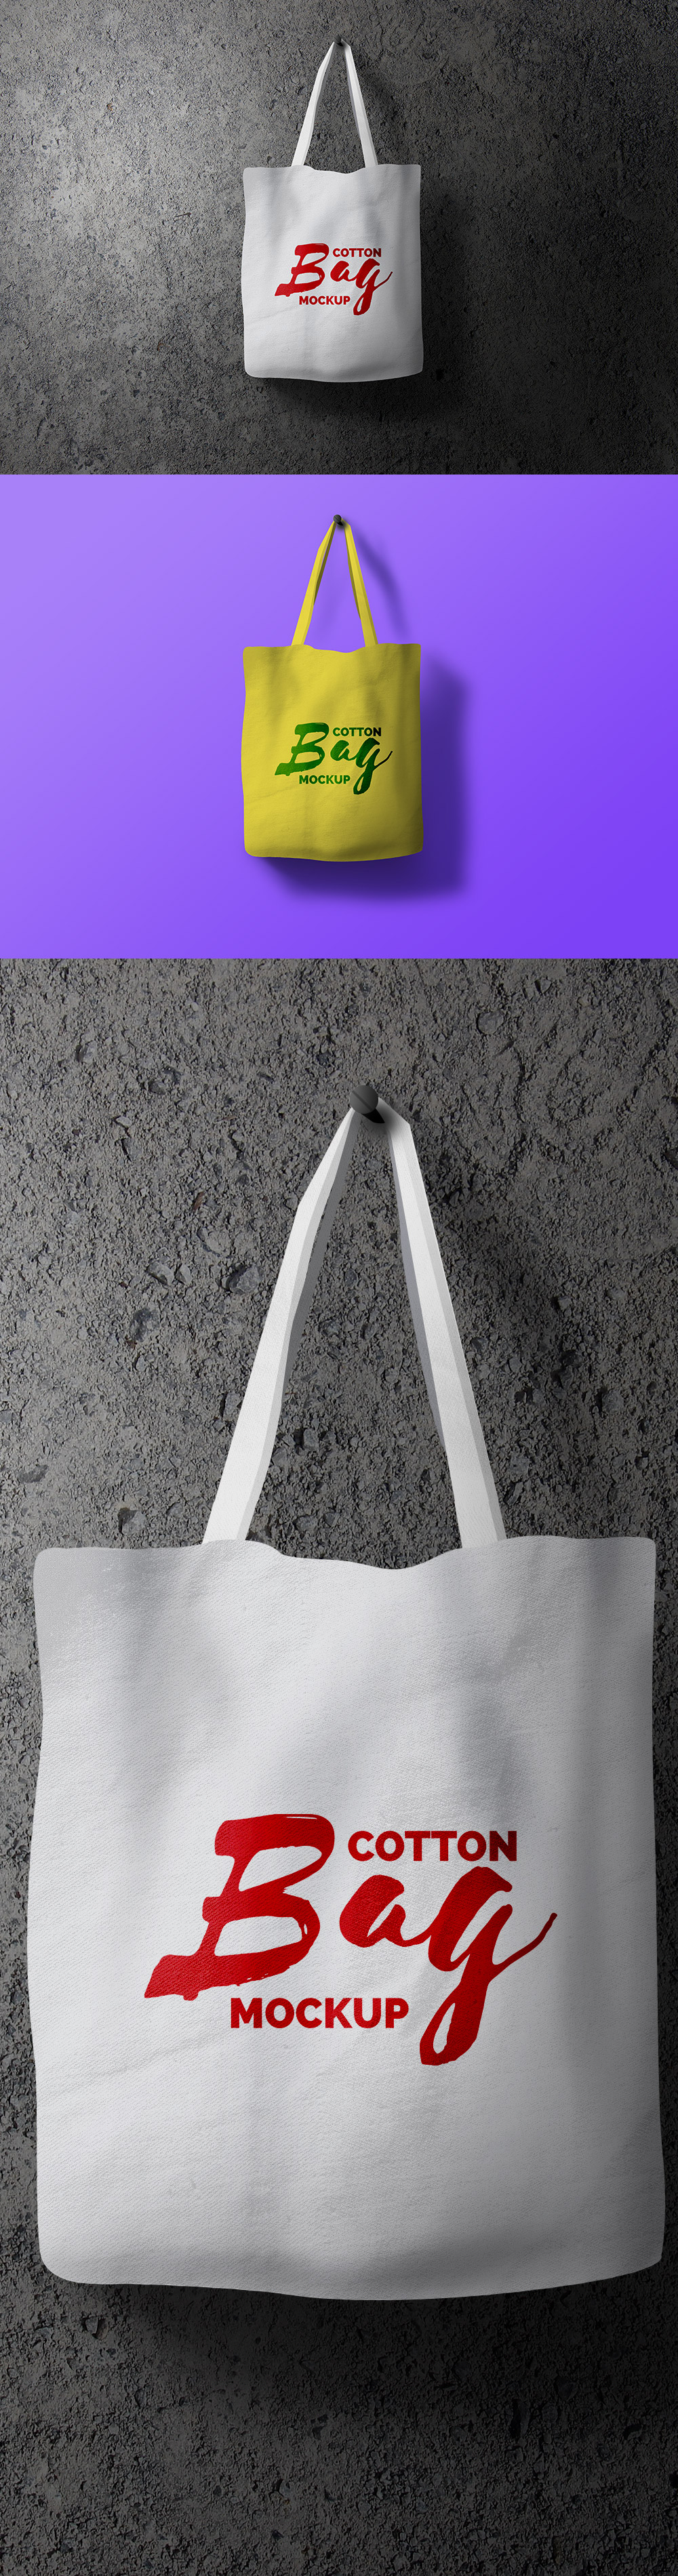 Download Cotton Bag Mockup Psd Graphicsfuel Bag Mockup Photoshop Mockup Free Mockup Free Psd Download